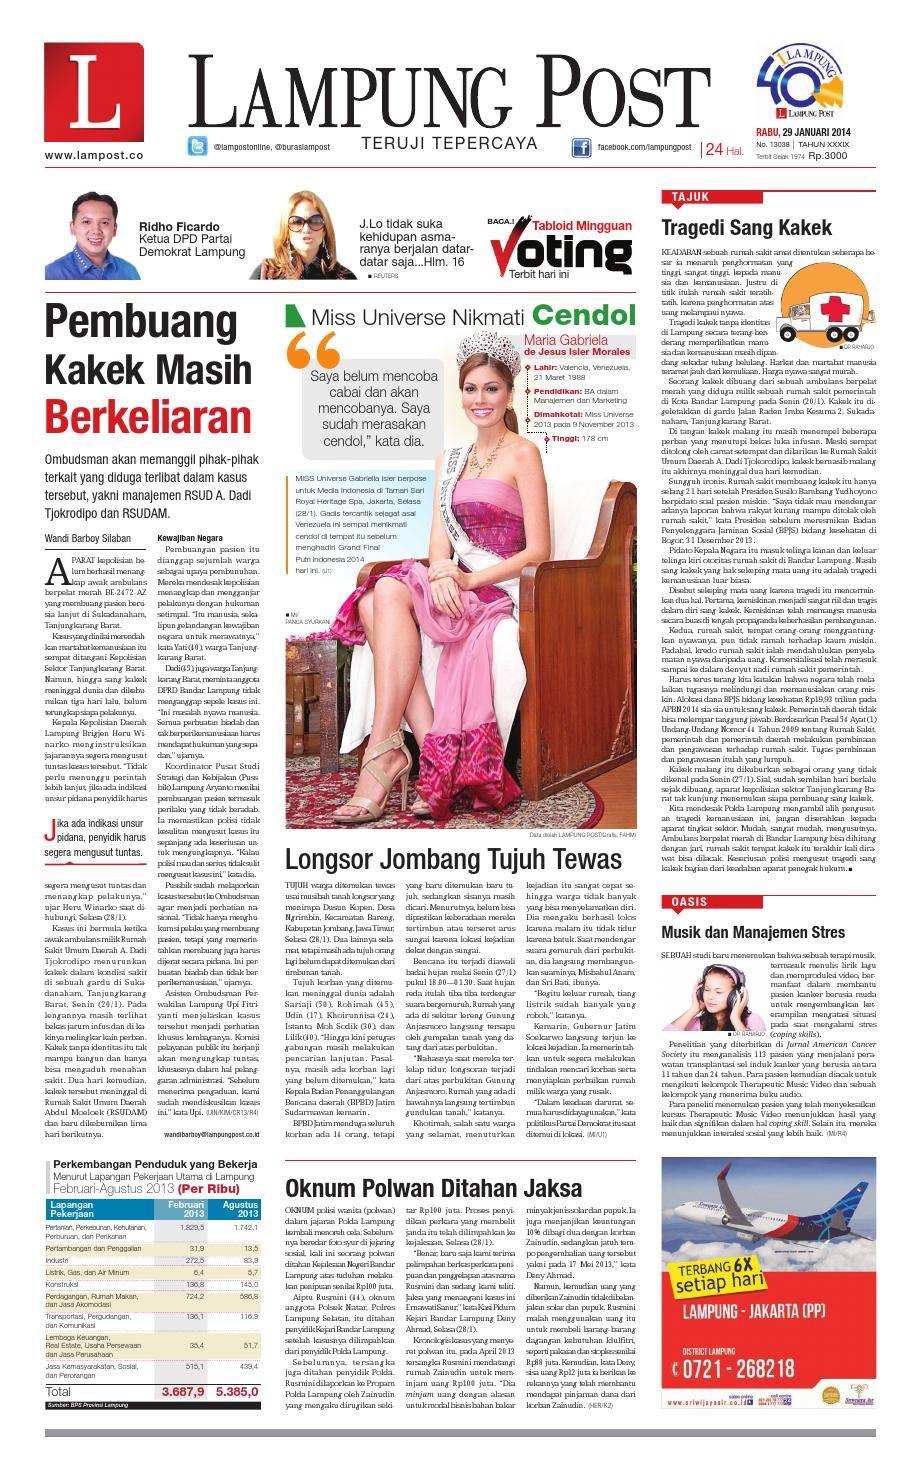 Lampung Post Rabu 29 Januari 2014 By Issuu Rkb Tegal Madu Mongso